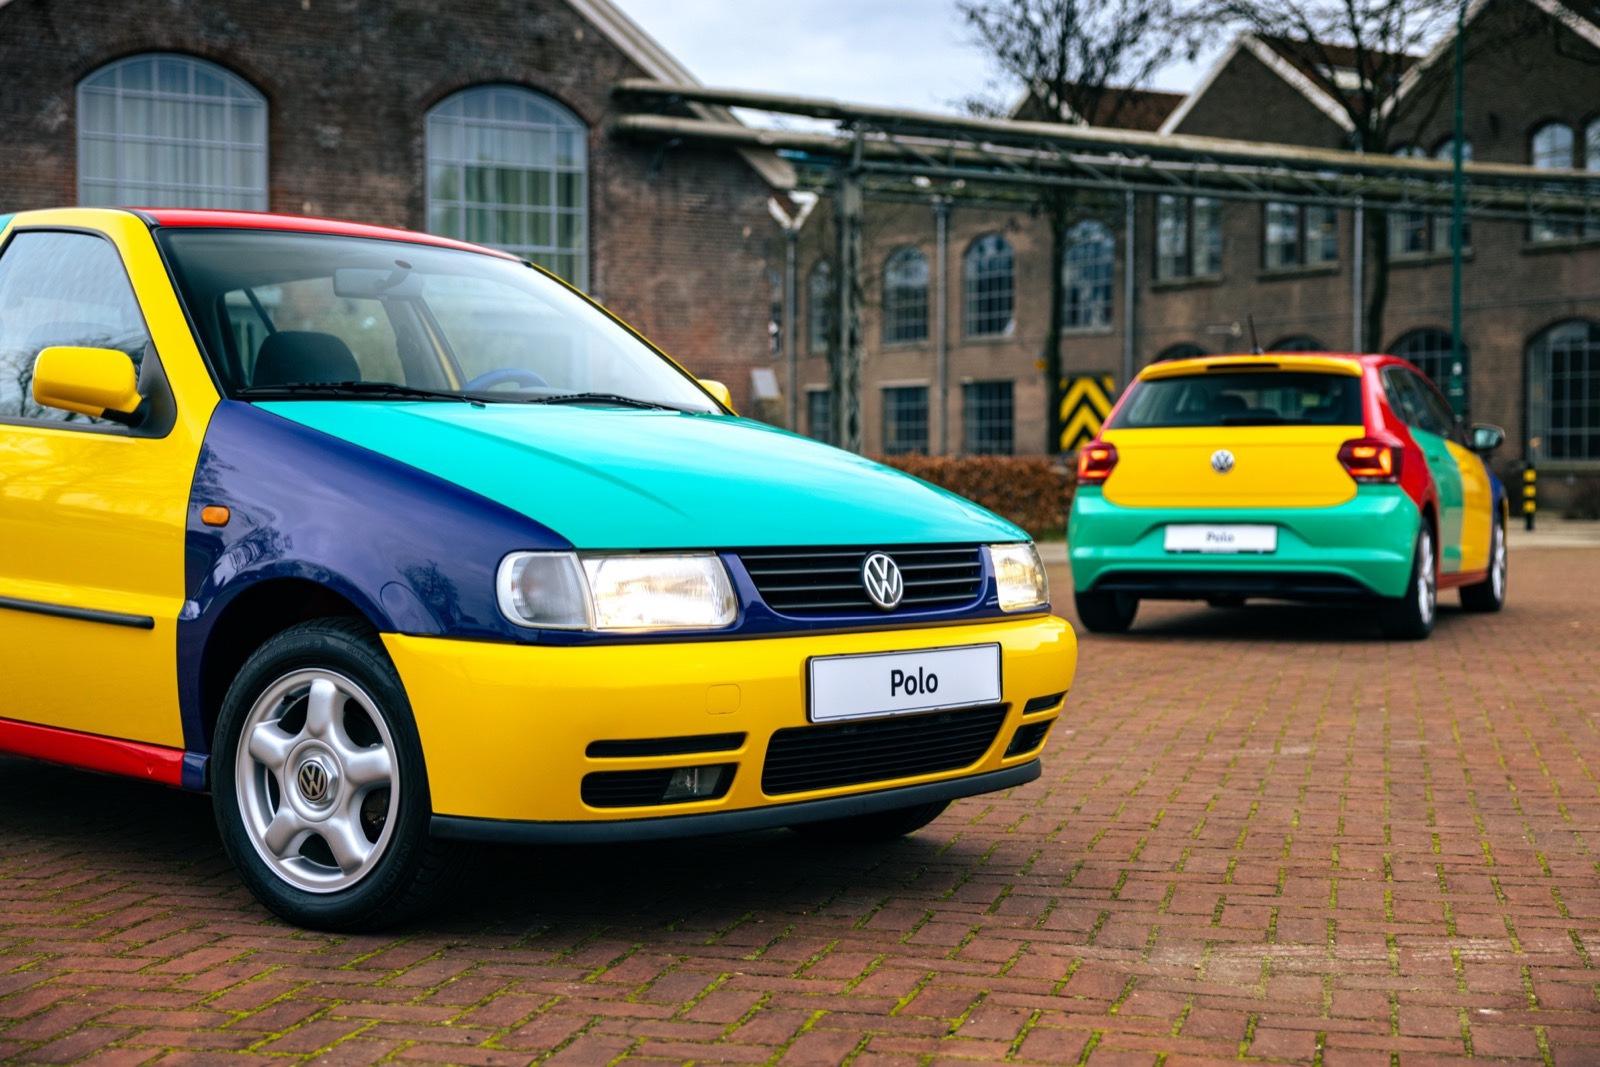 Volkswagen_Netherlands_modern_Polo_Harlekin_0021